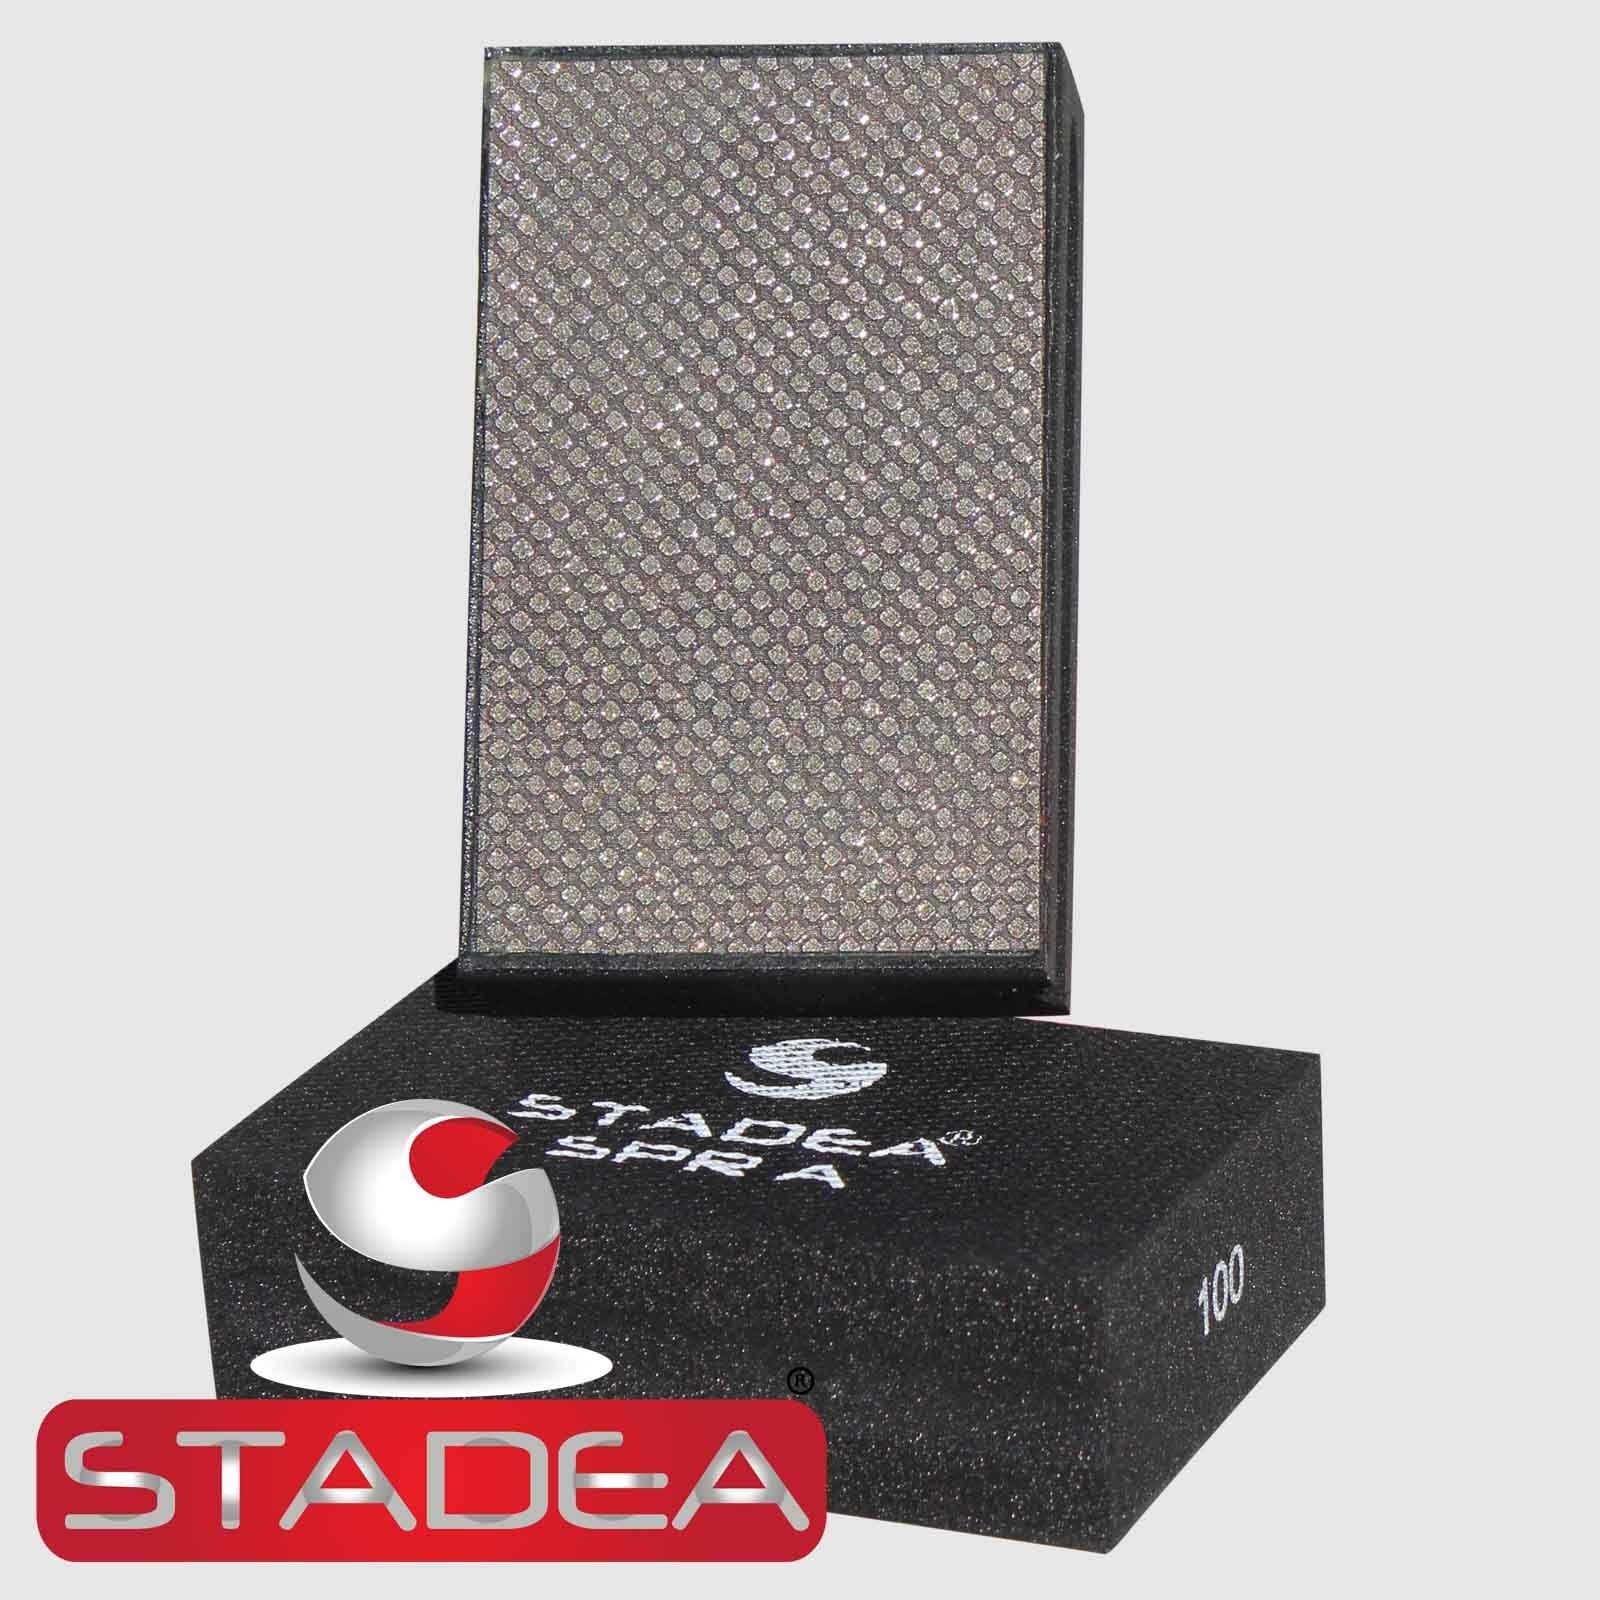 Stadea Diamond Hand Polishing Pads Set For Granite